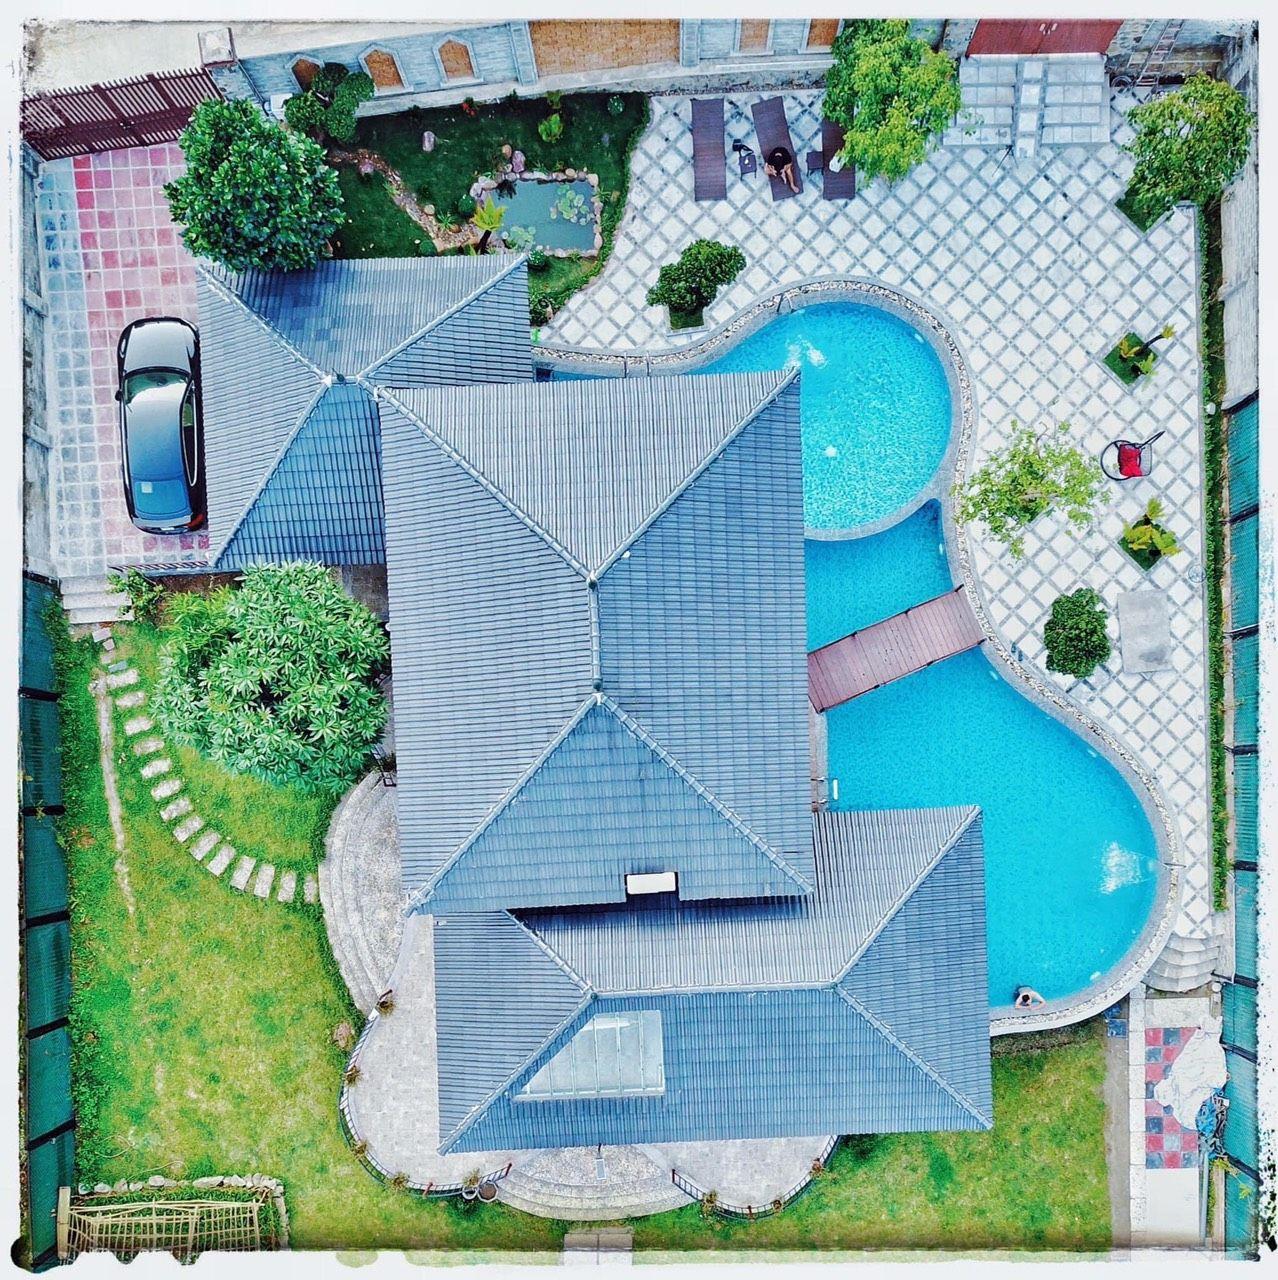 khong-gian-an-vien-villa-homestay-soc-son-ha-noi-14